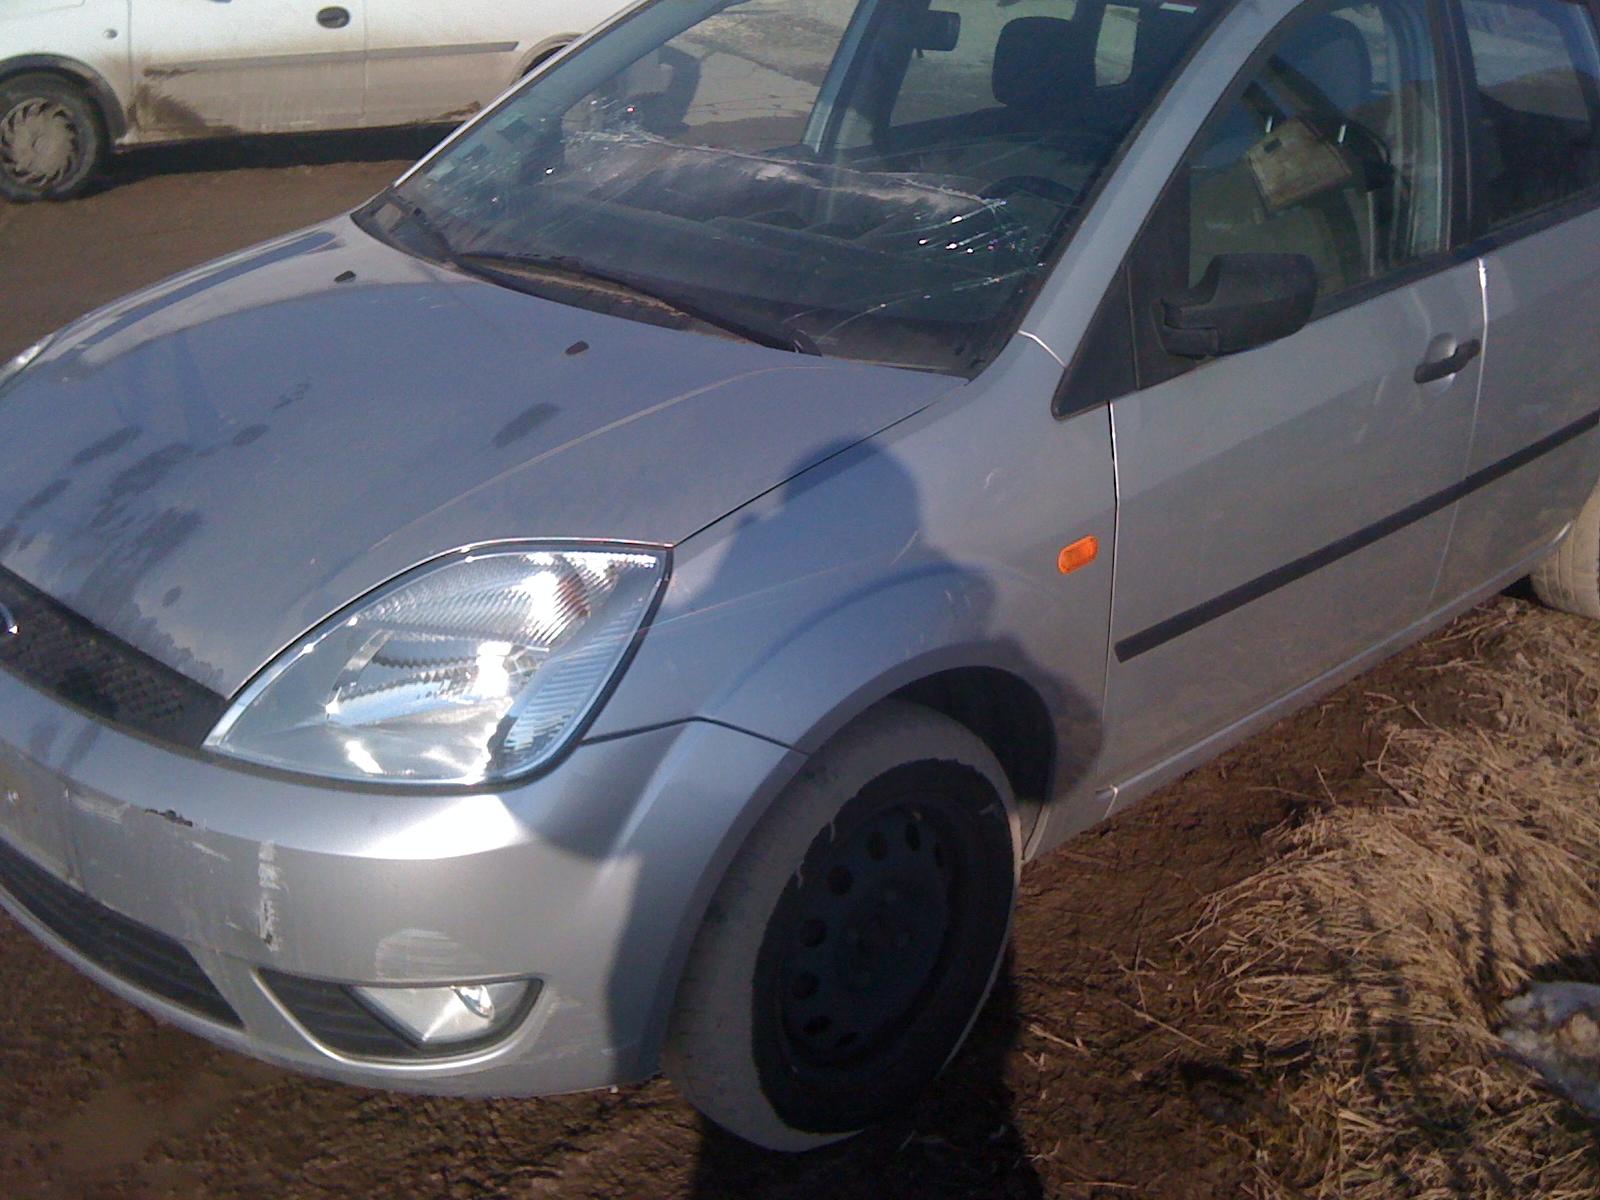 Ford Fiesta avariat 2003 Benzina Hatchback - 14 Februarie 2011 - Poza 3